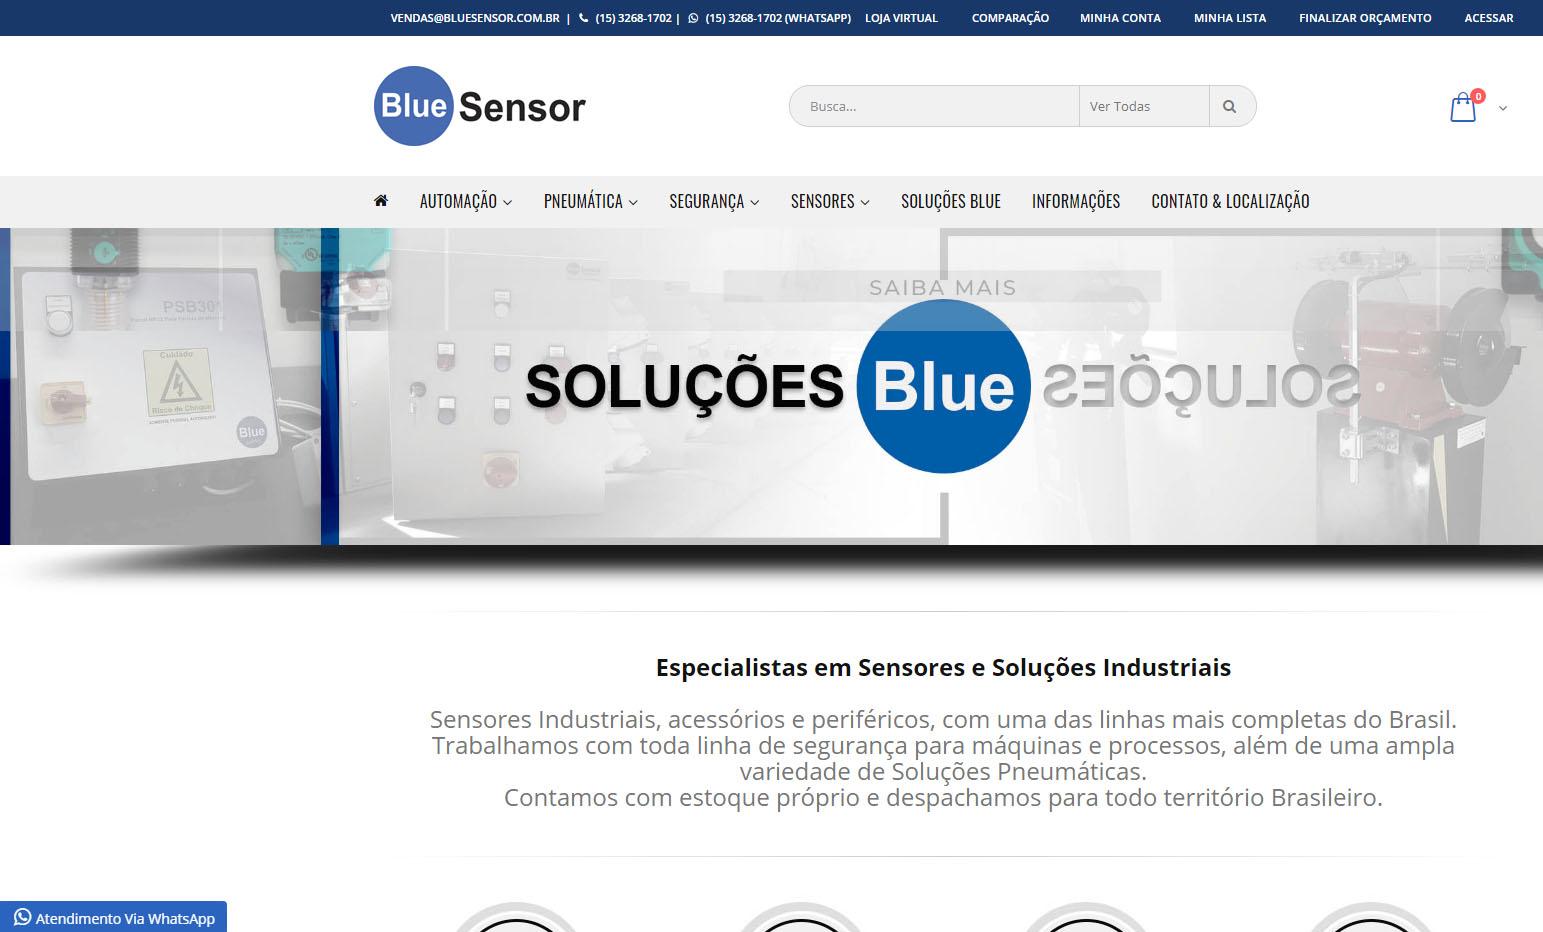 Blue Sensor